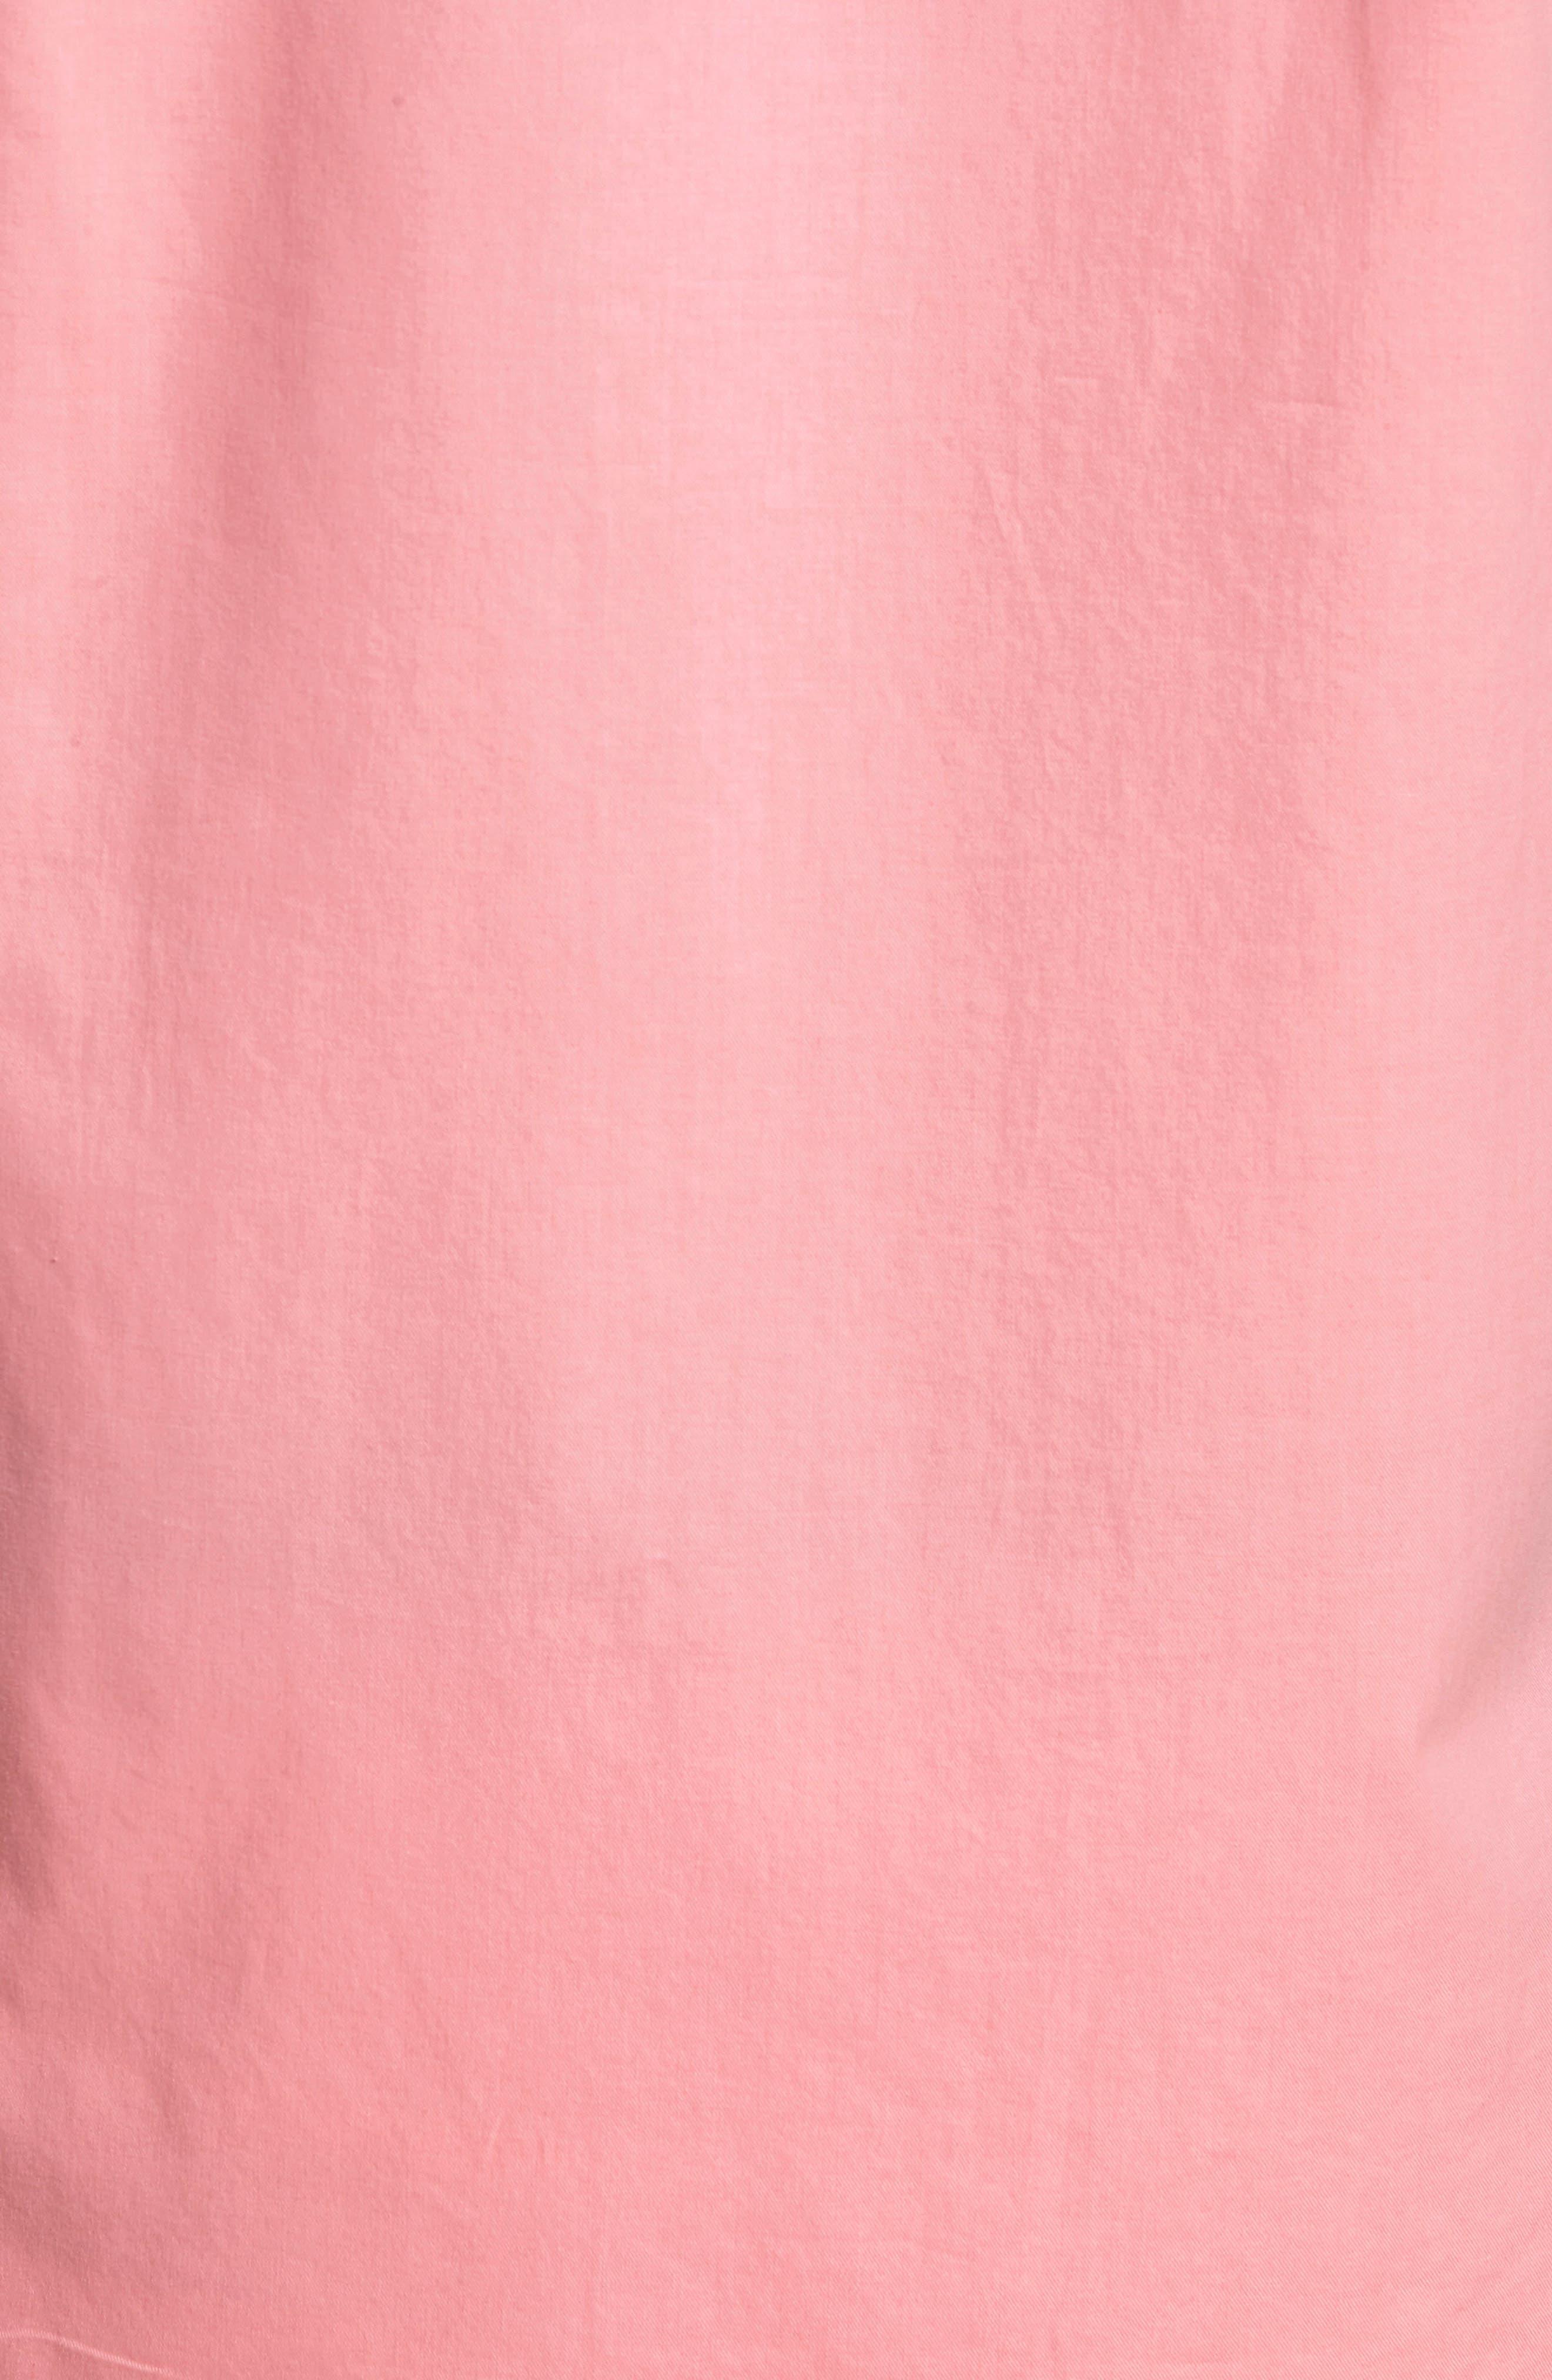 Slim Fit Short Sleeve Sport Shirt,                             Alternate thumbnail 5, color,                             Garment Dye - Pacific Pink